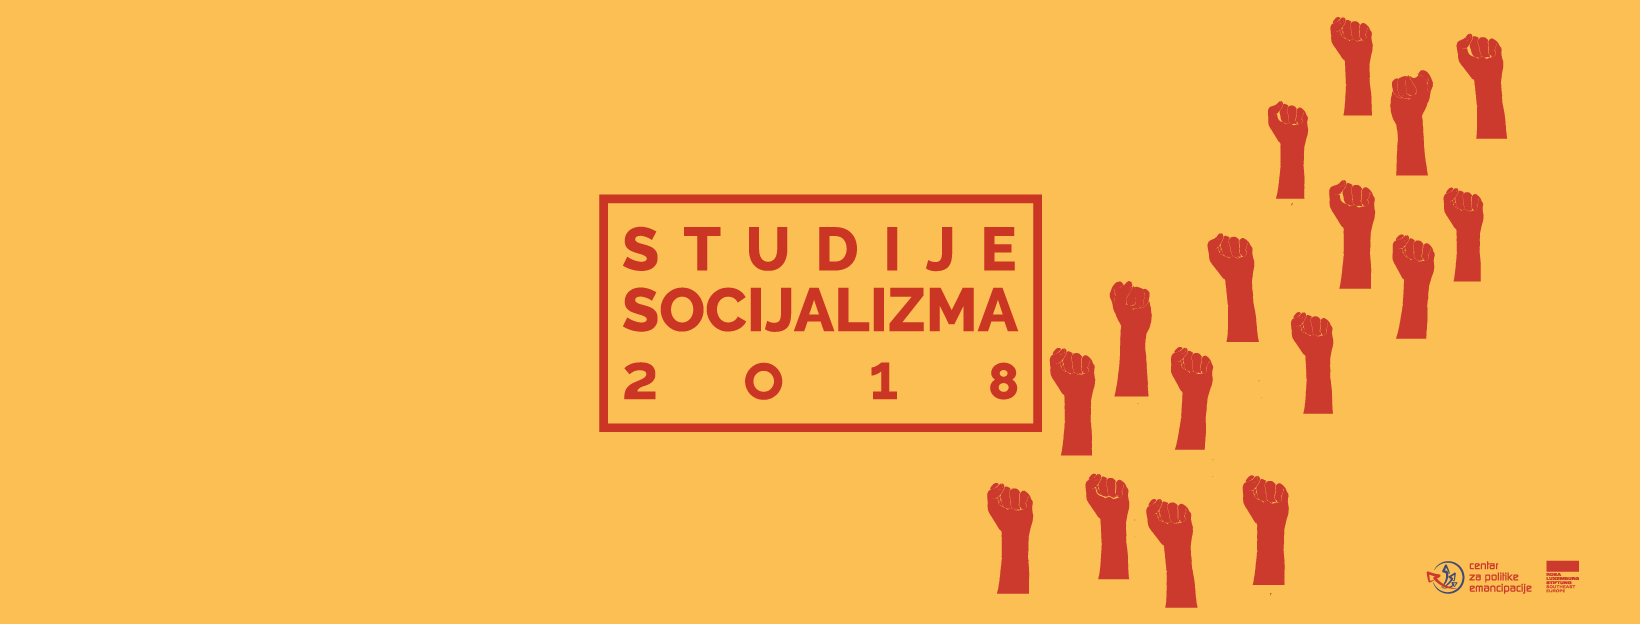 Razgovor: Uspon radikalne desnice u Evropi